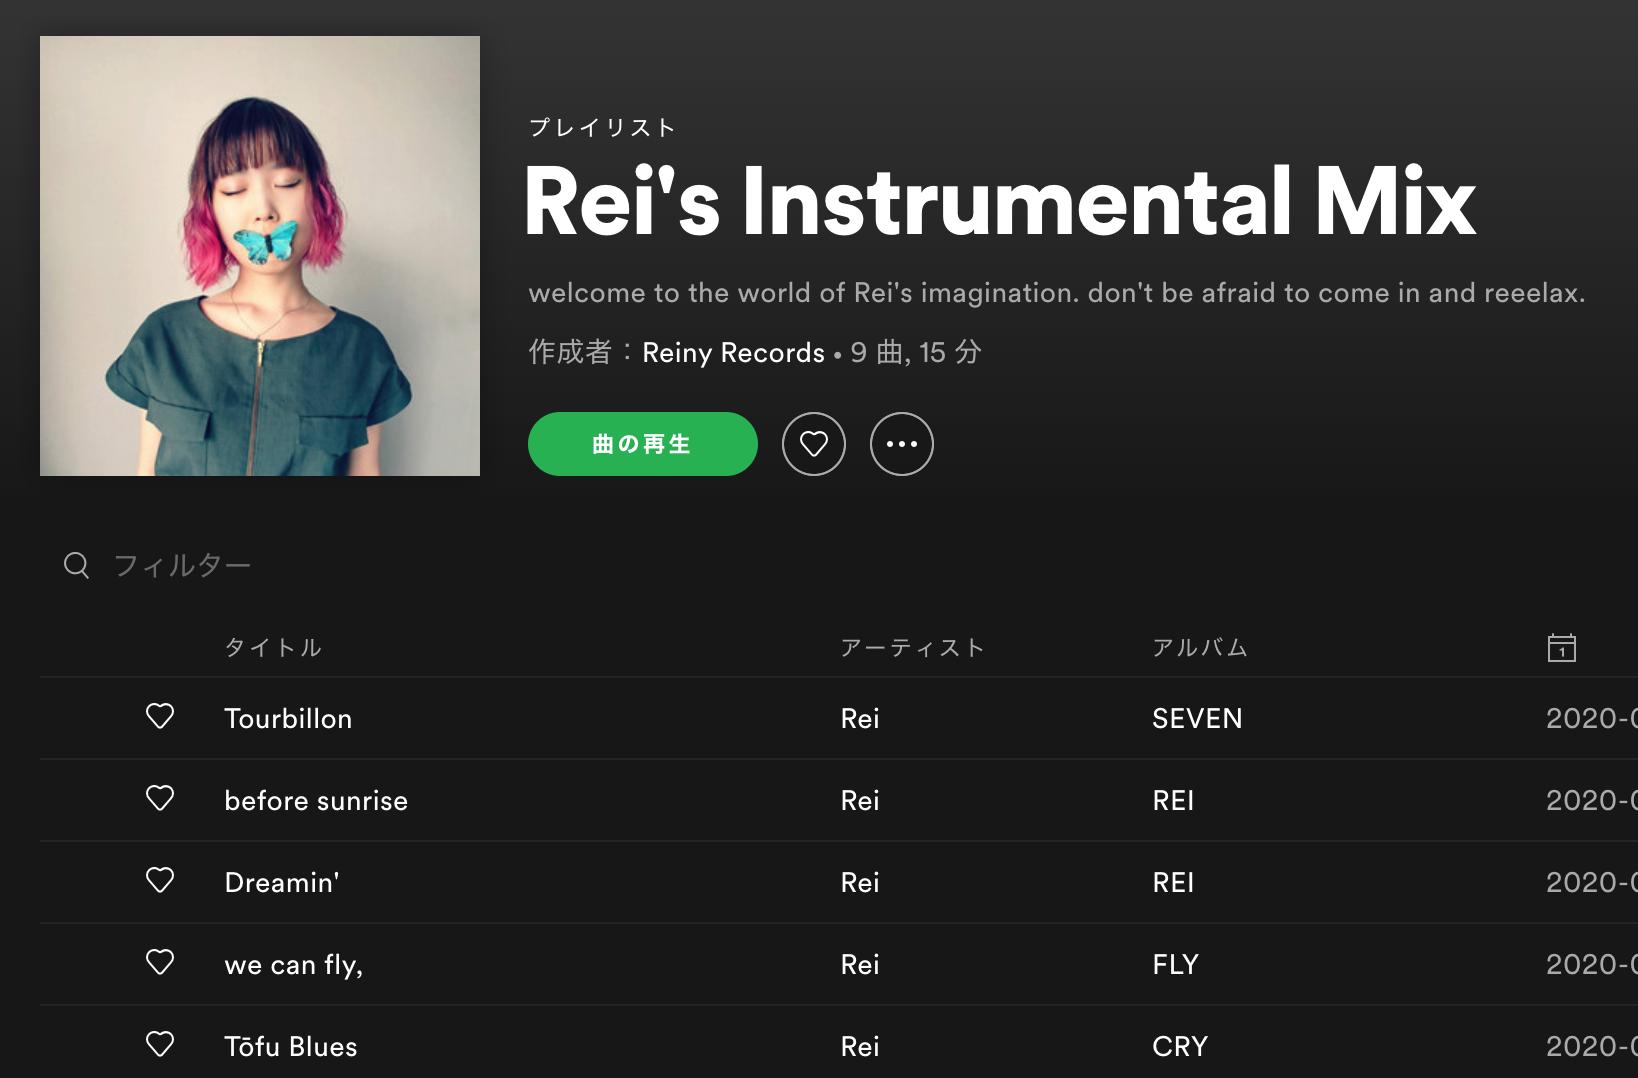 Rei's Instrumental Mix